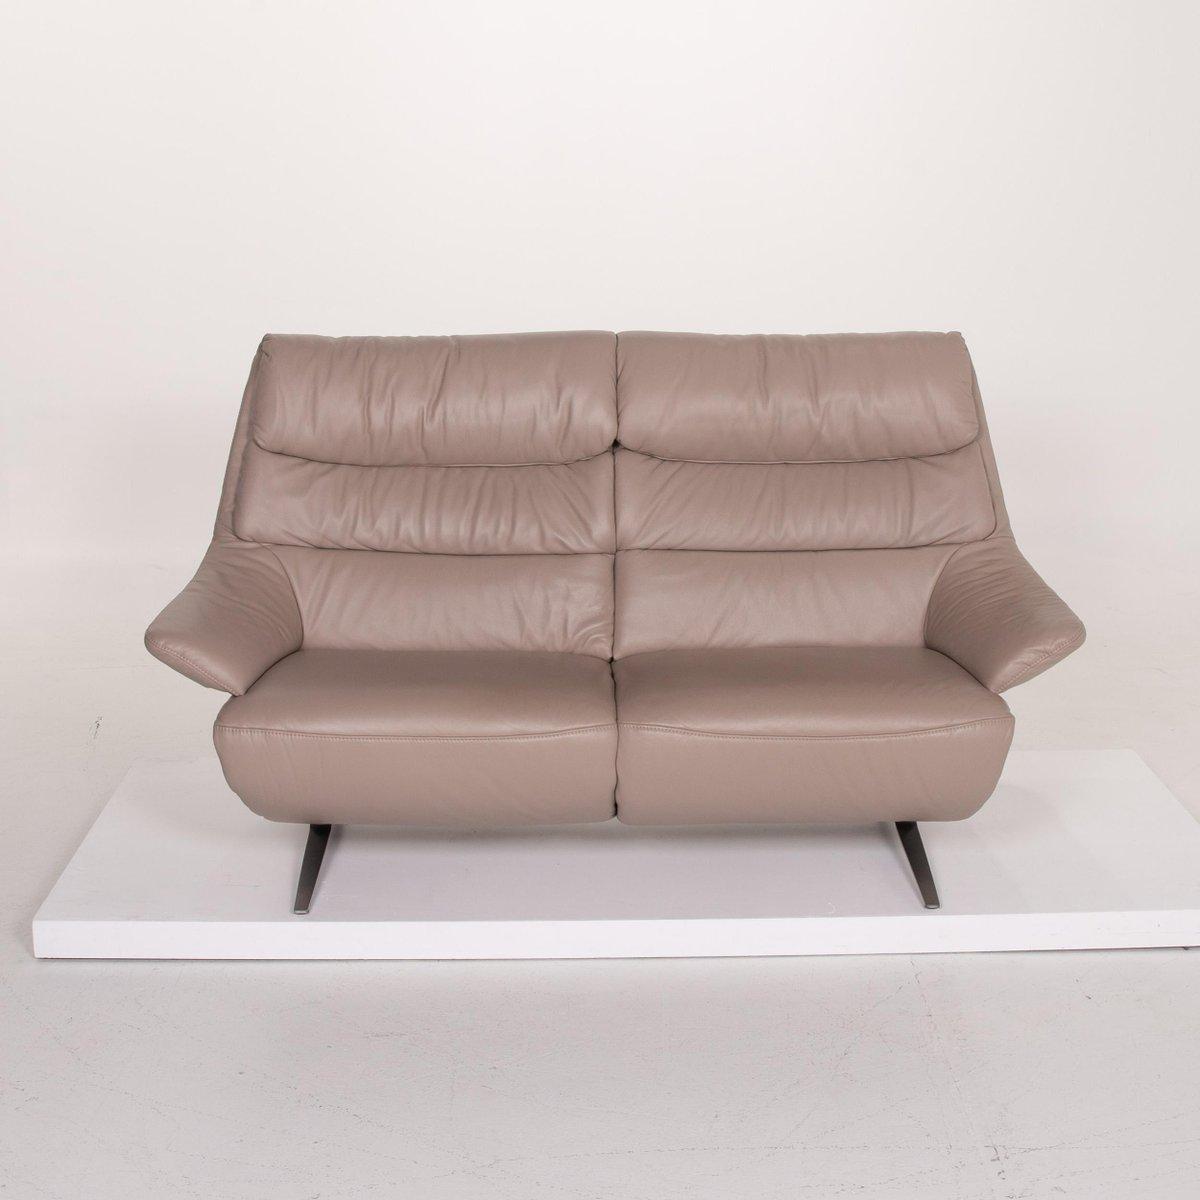 Himolla 12 Beige Leather Sofa